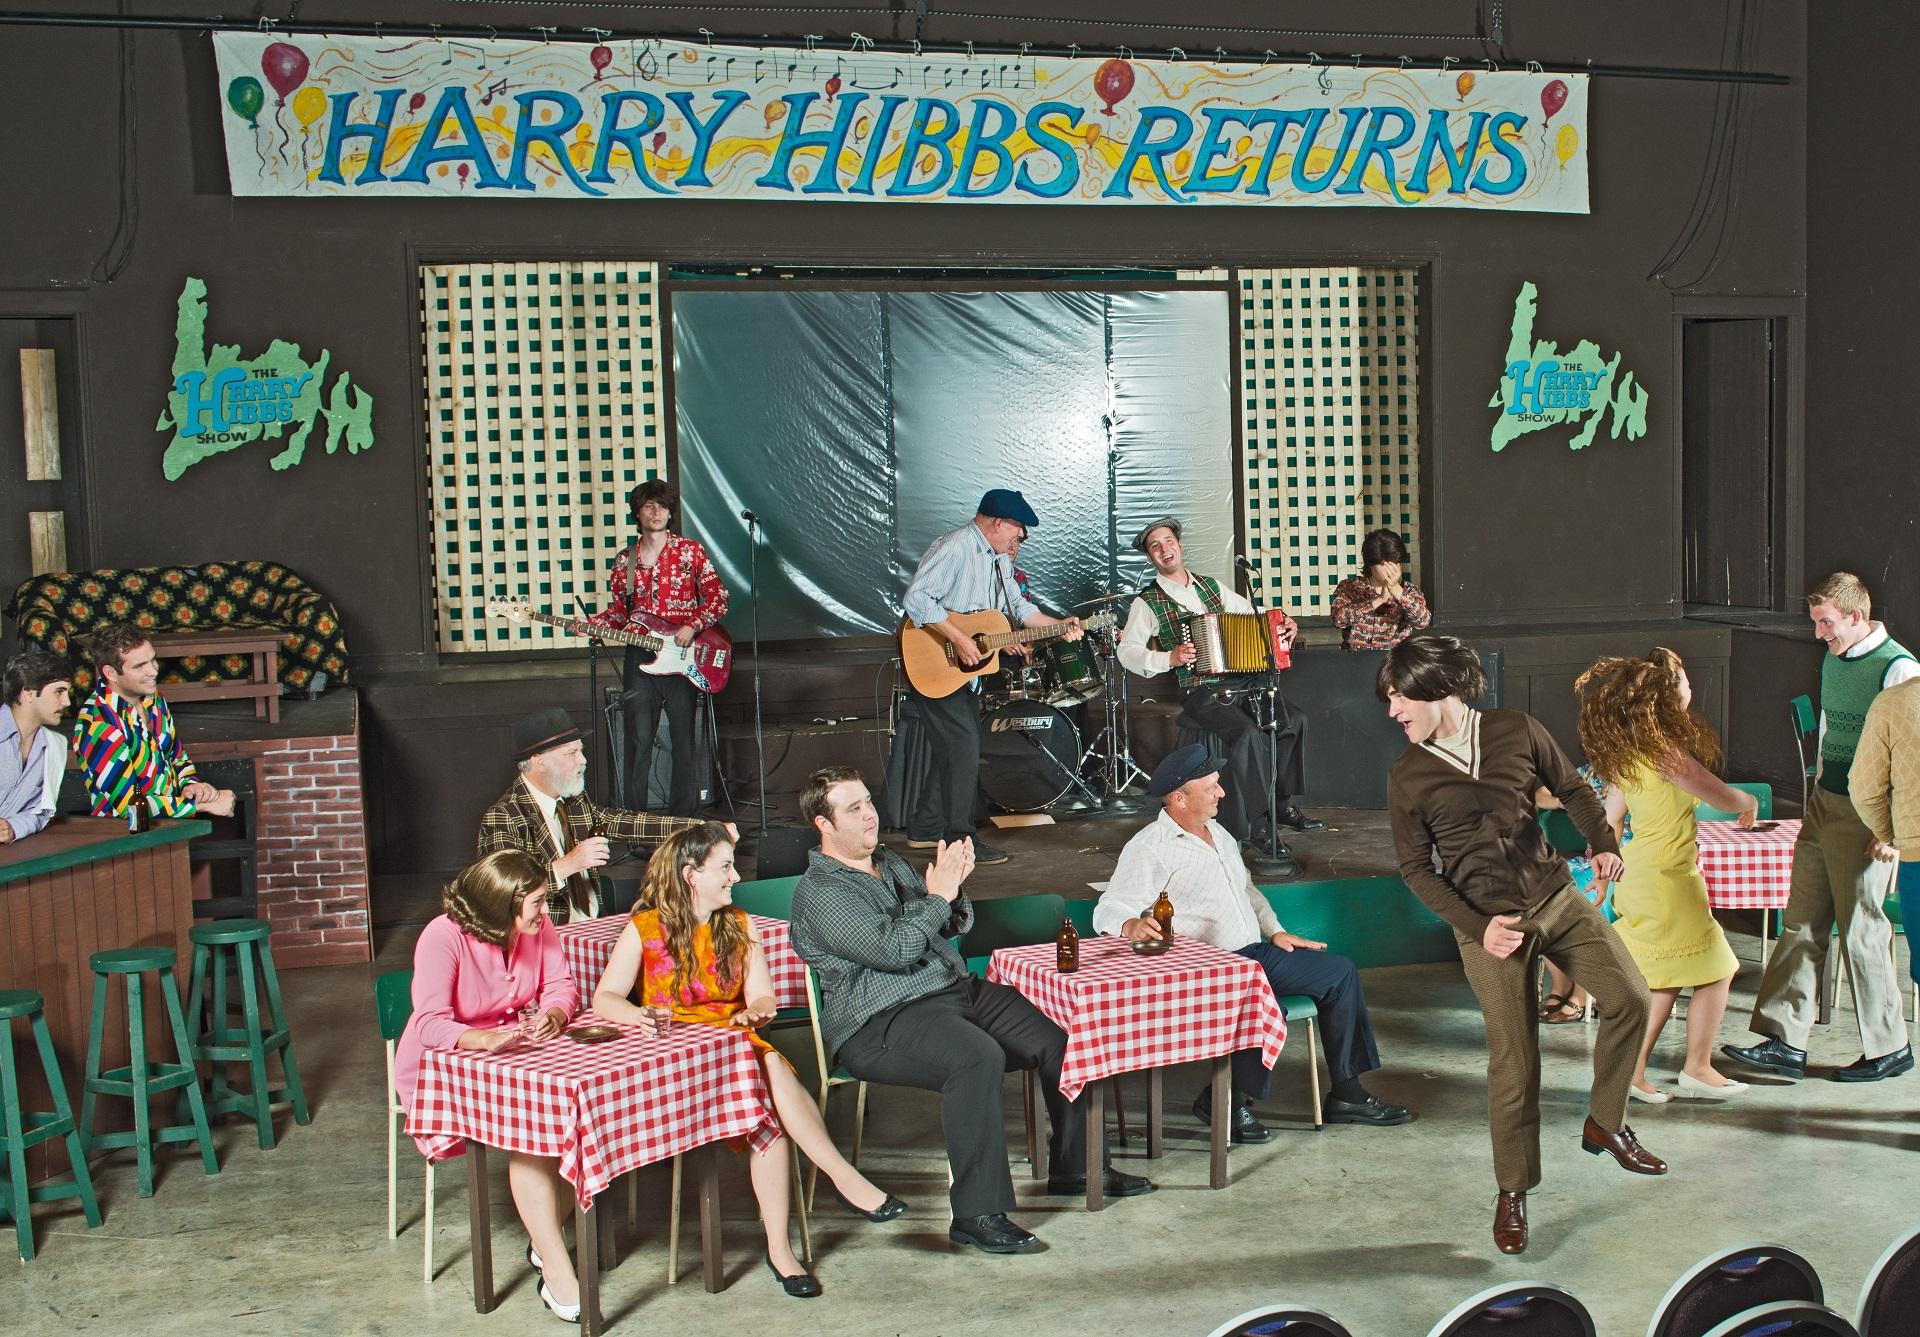 Harry Hibbs Returns